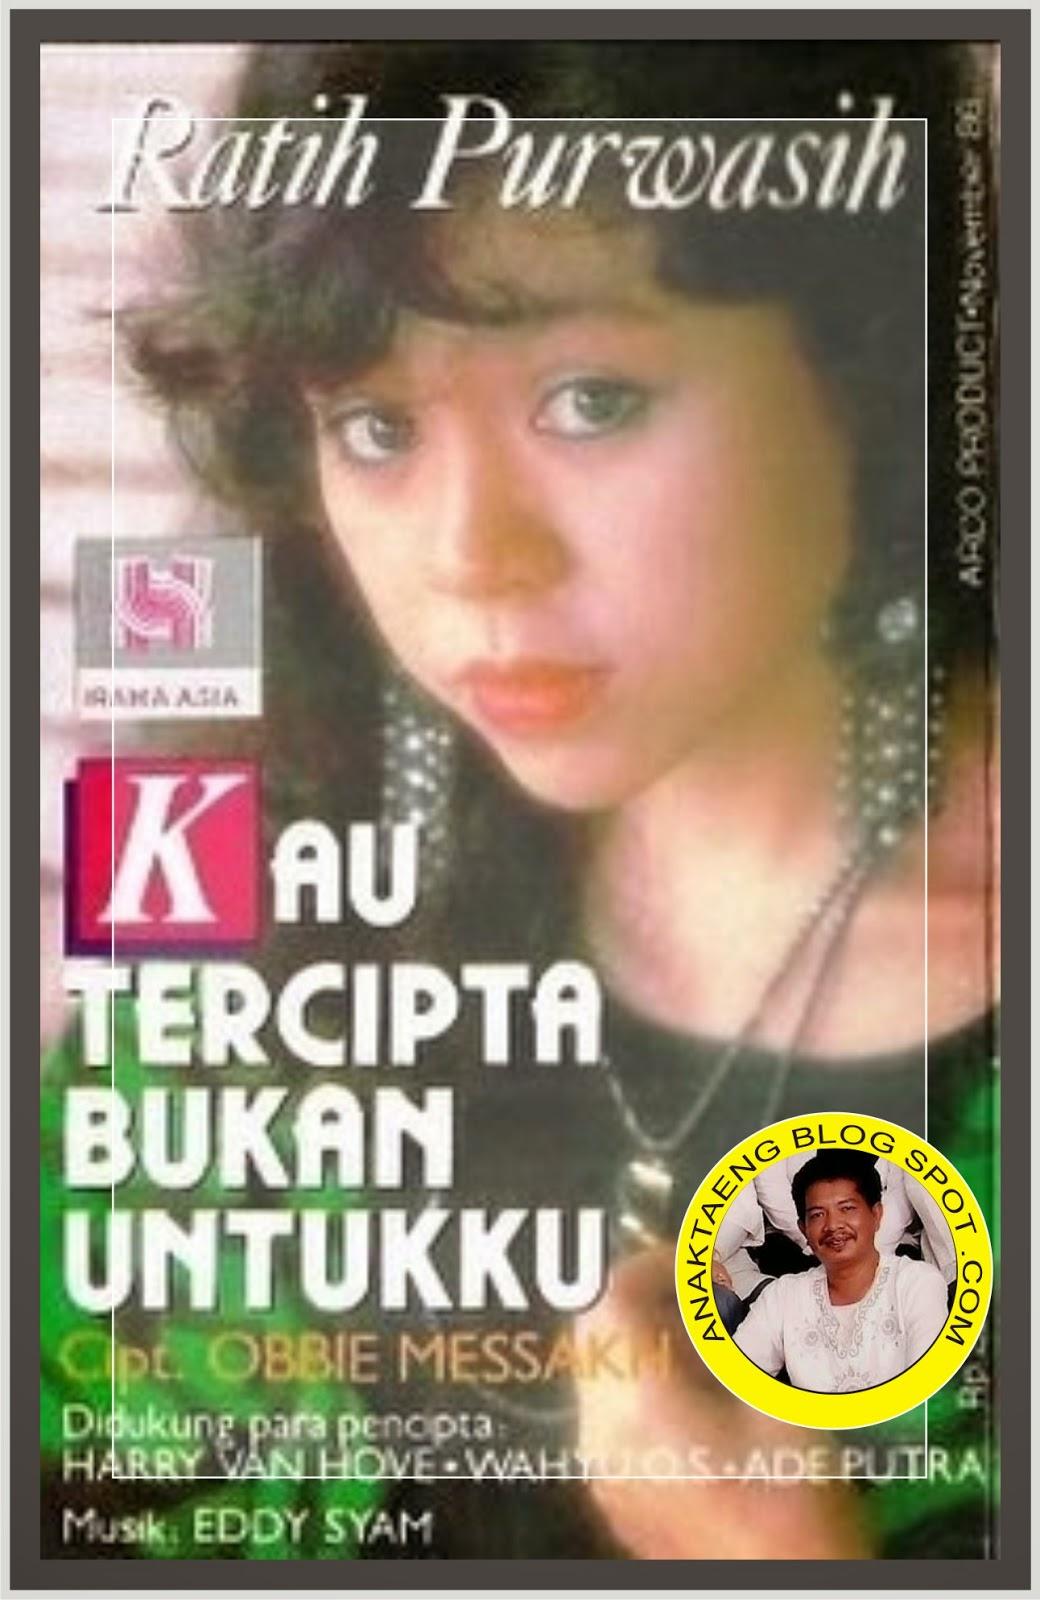 Lagu2 Manis Ratih Purwasihlagu2 Manis Ratih Purwasih